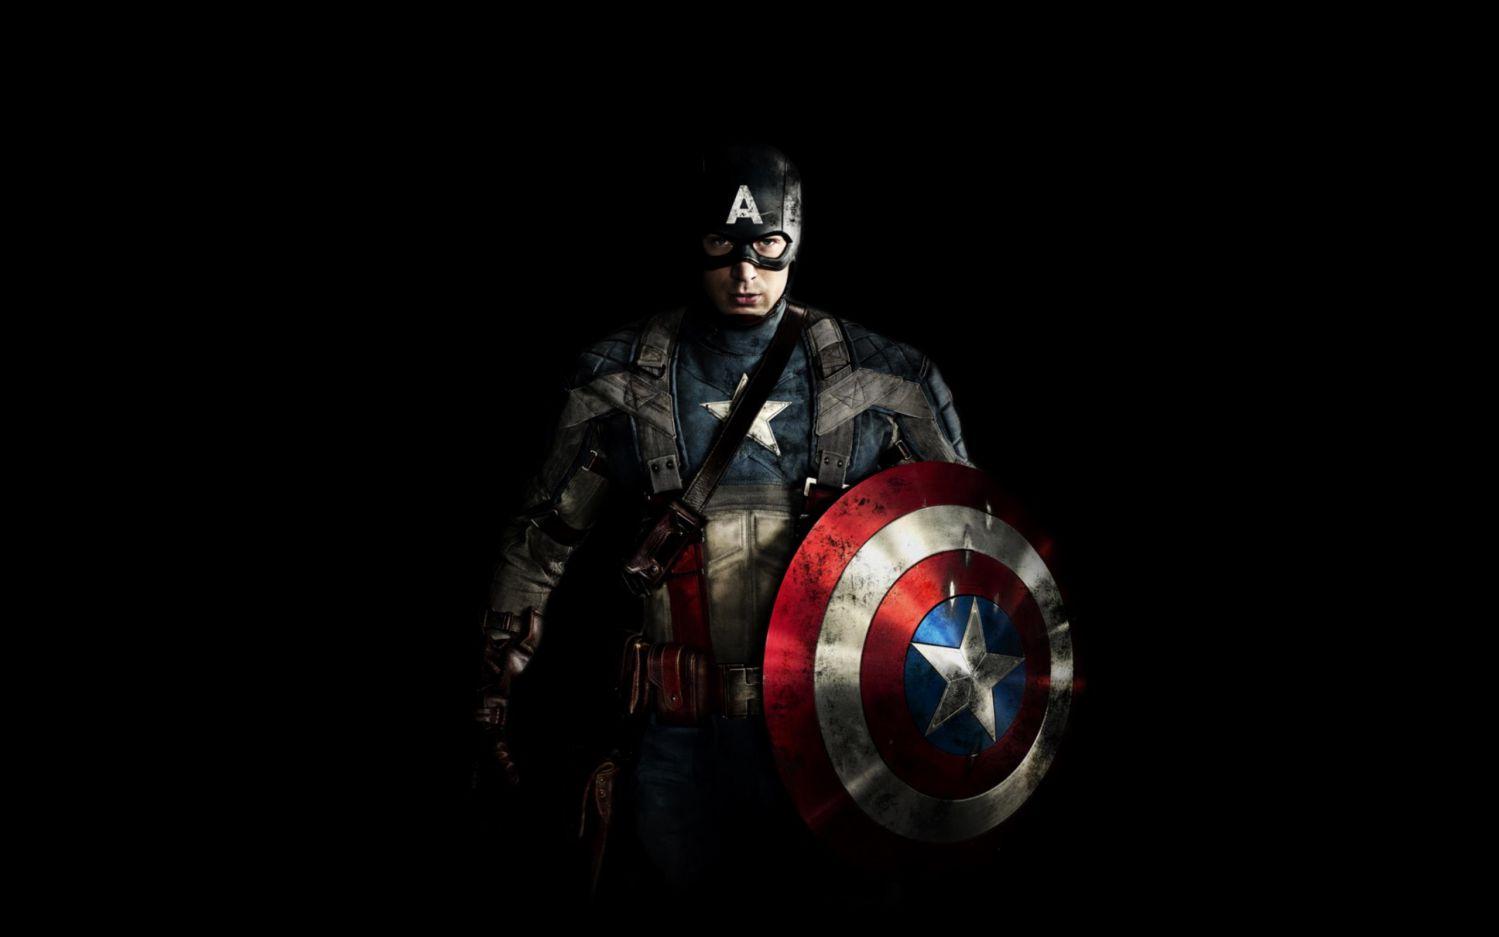 Top 7 Things that make Superheroes Wallpapers 4K the Best Phone Background App